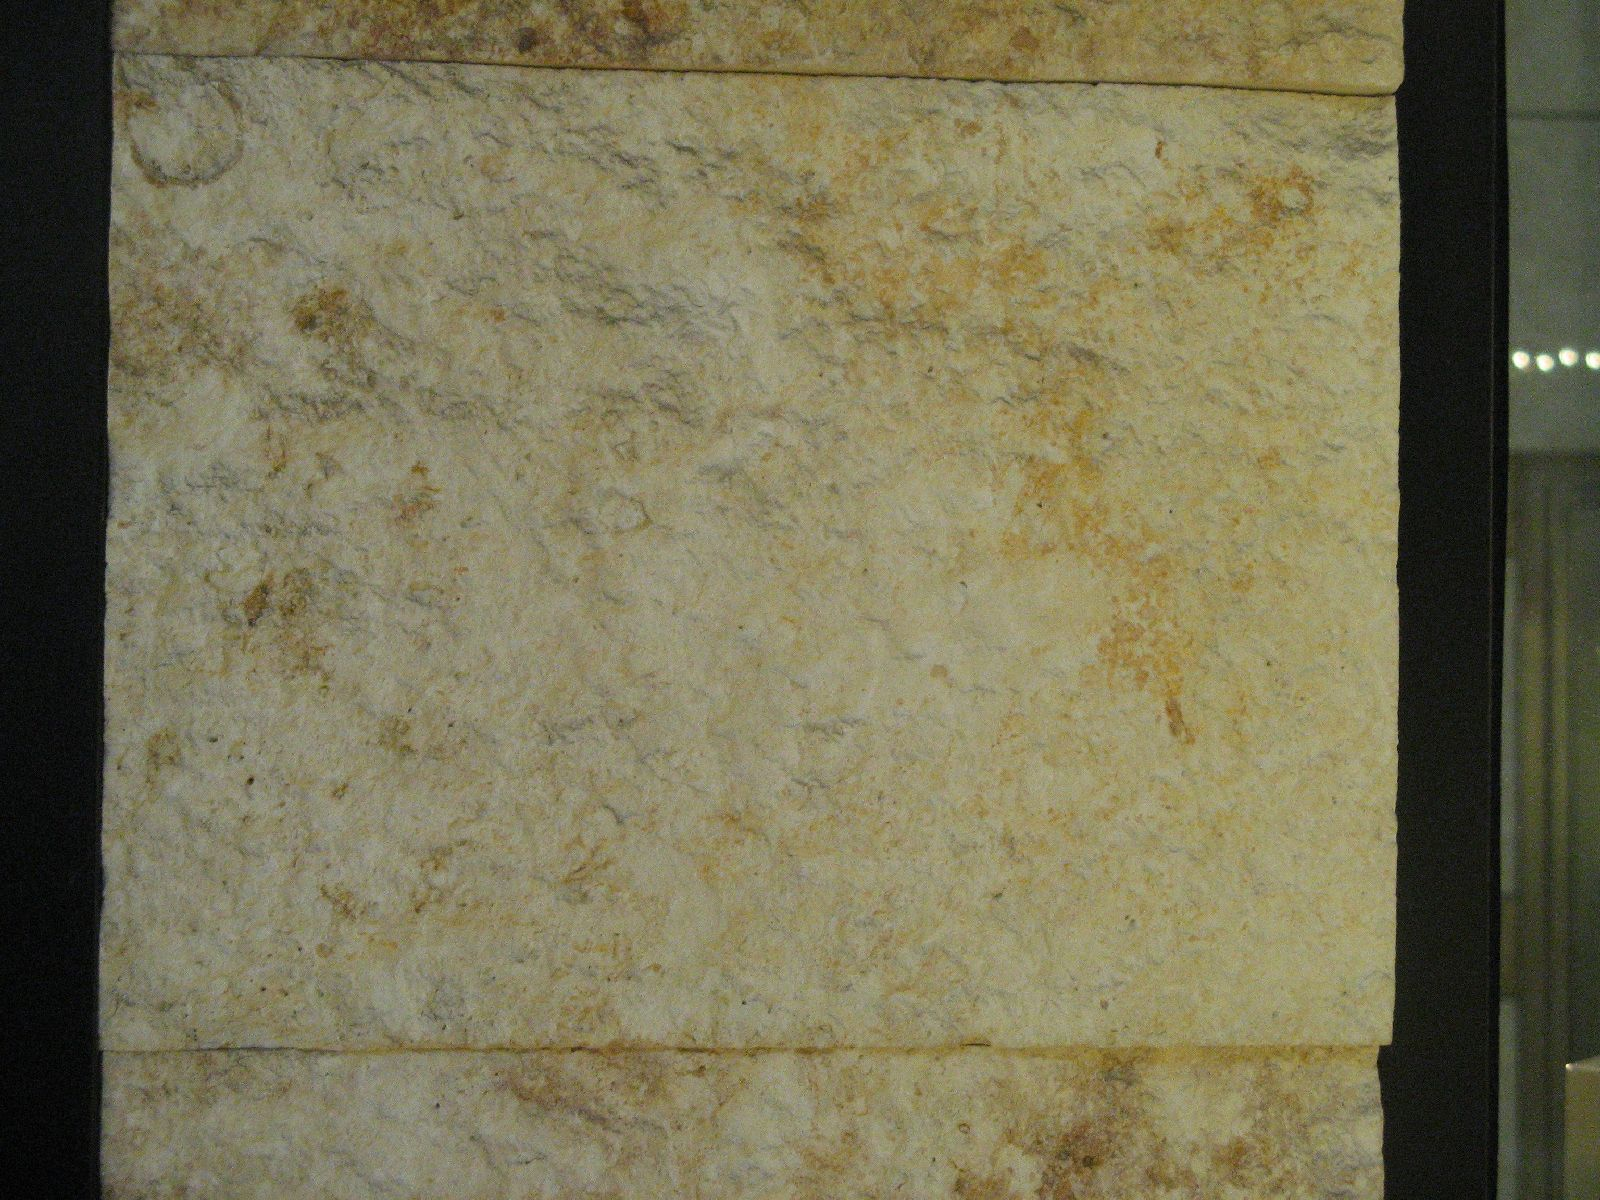 Stone_Texture_B_3712